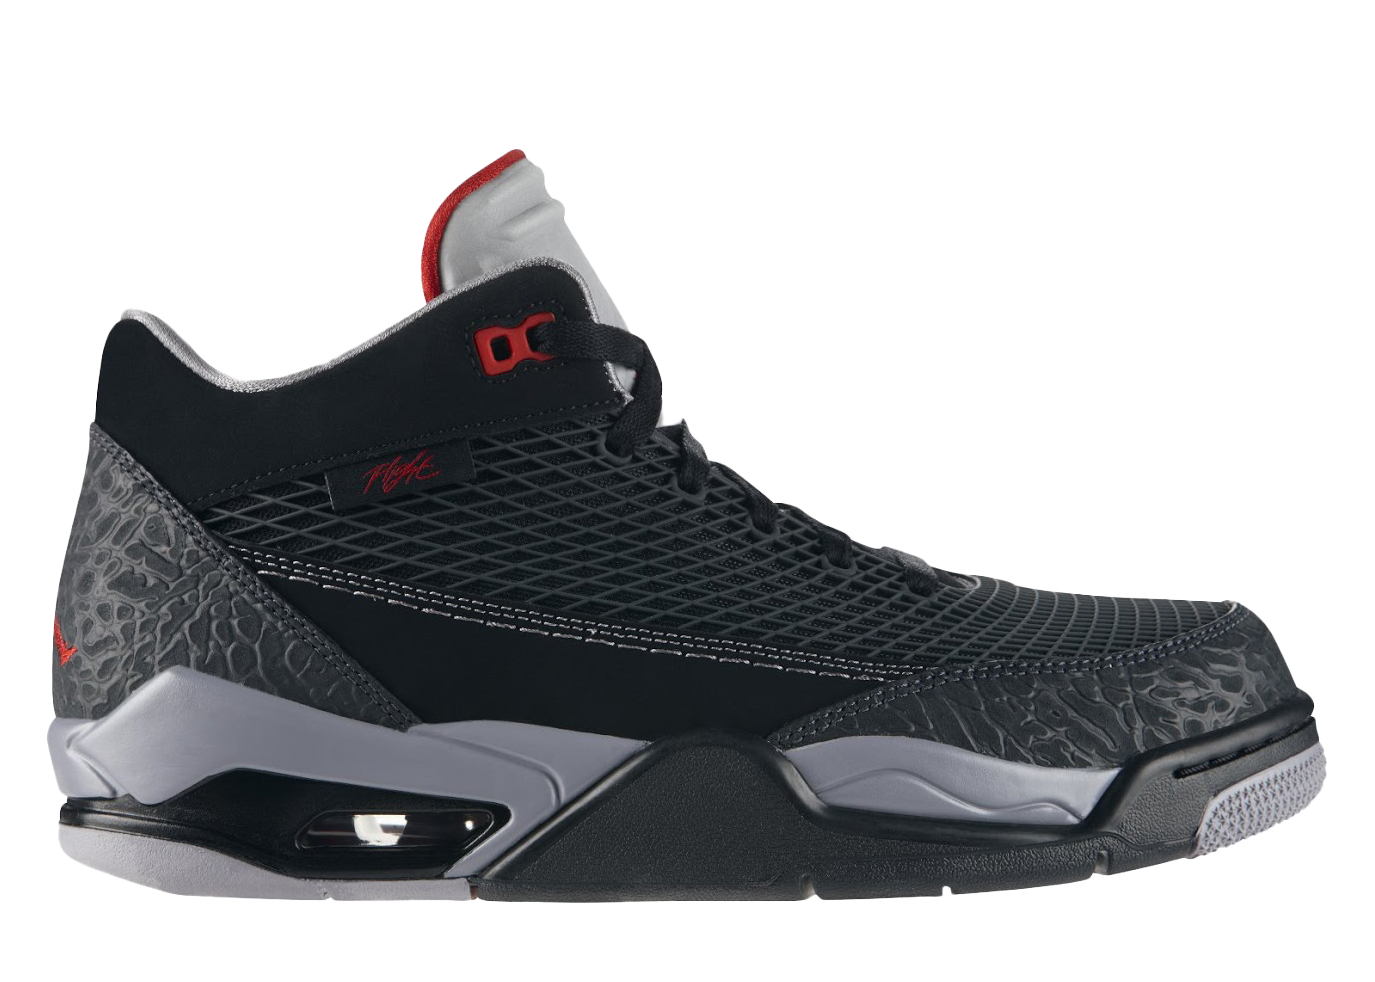 Jordan Flight Club 80s Black Gym Red